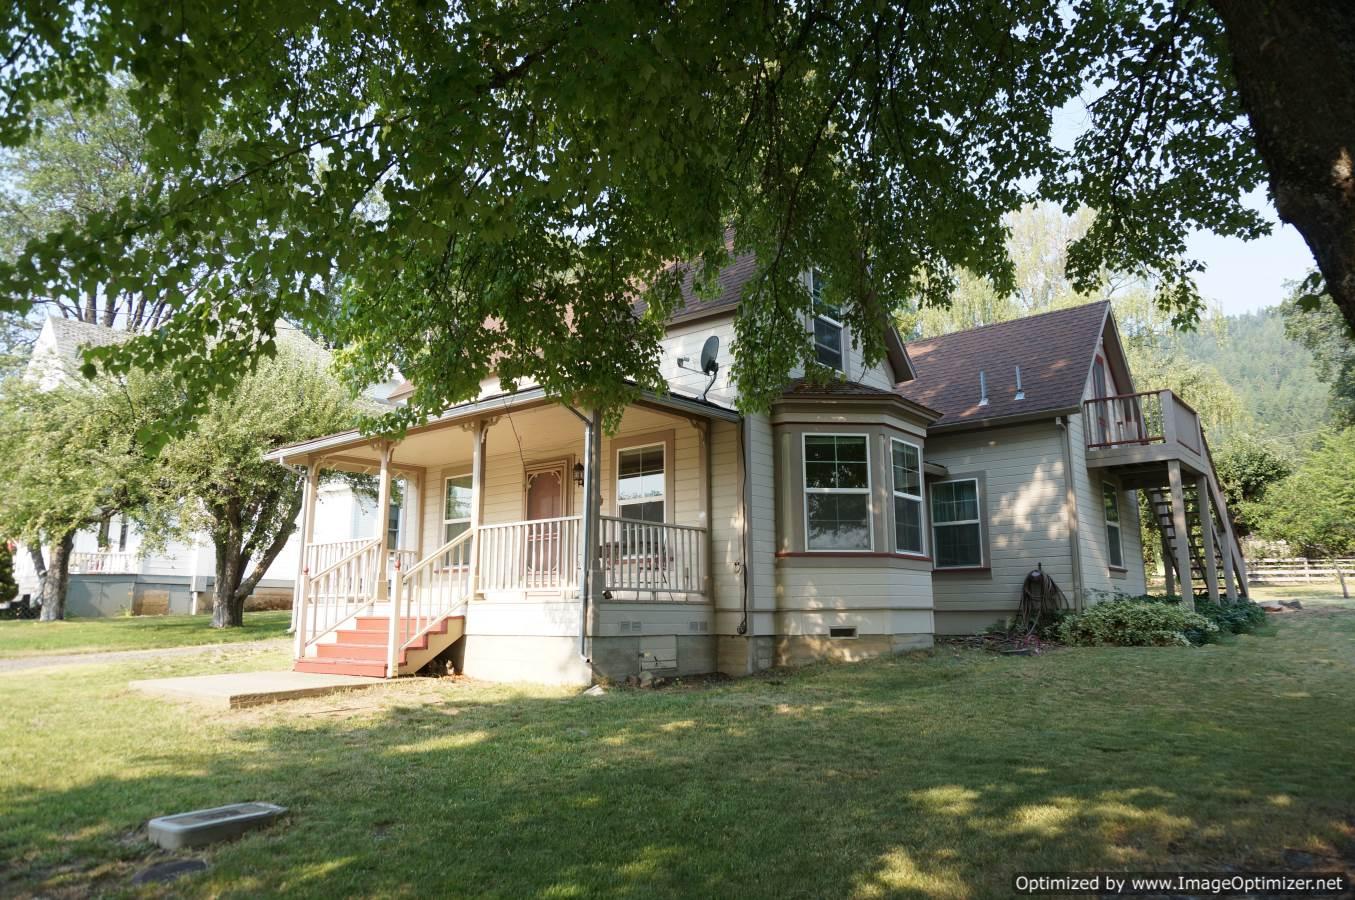 Scott Valley Homes for sale | Bryan Street Etna, CA